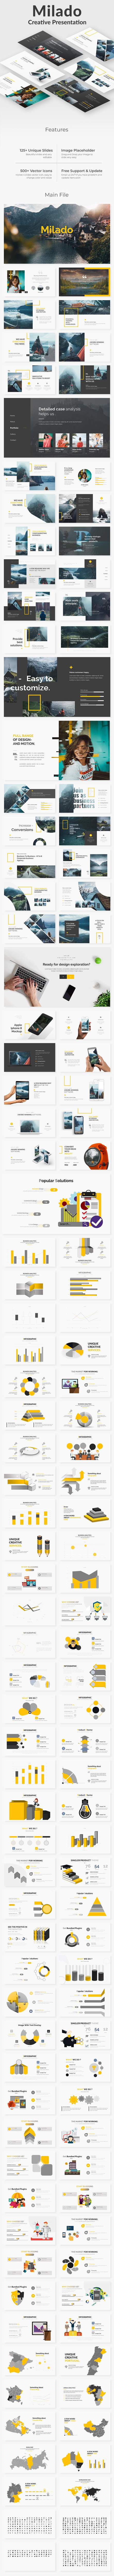 Milado Creative Design Keynote Template - Creative Keynote Templates